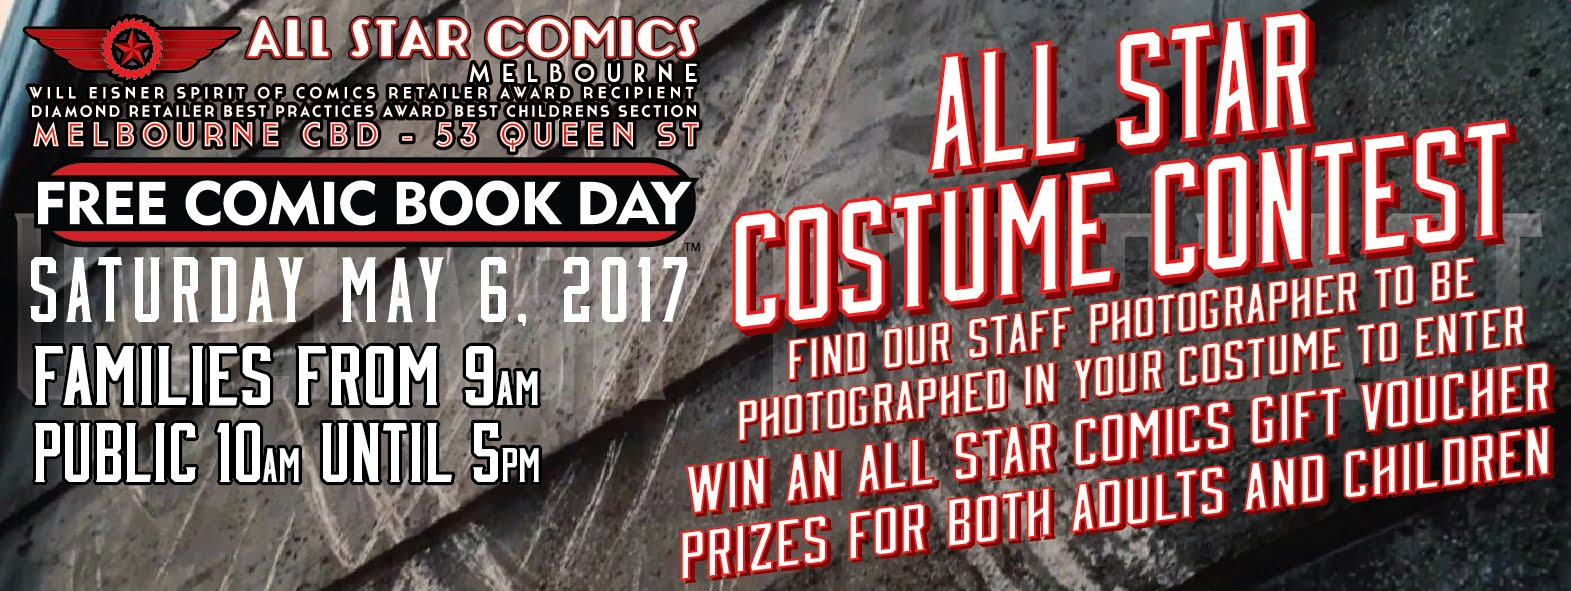 All Star Comics Melbourne: FREE COMIC BOOK DAY ALL STAR